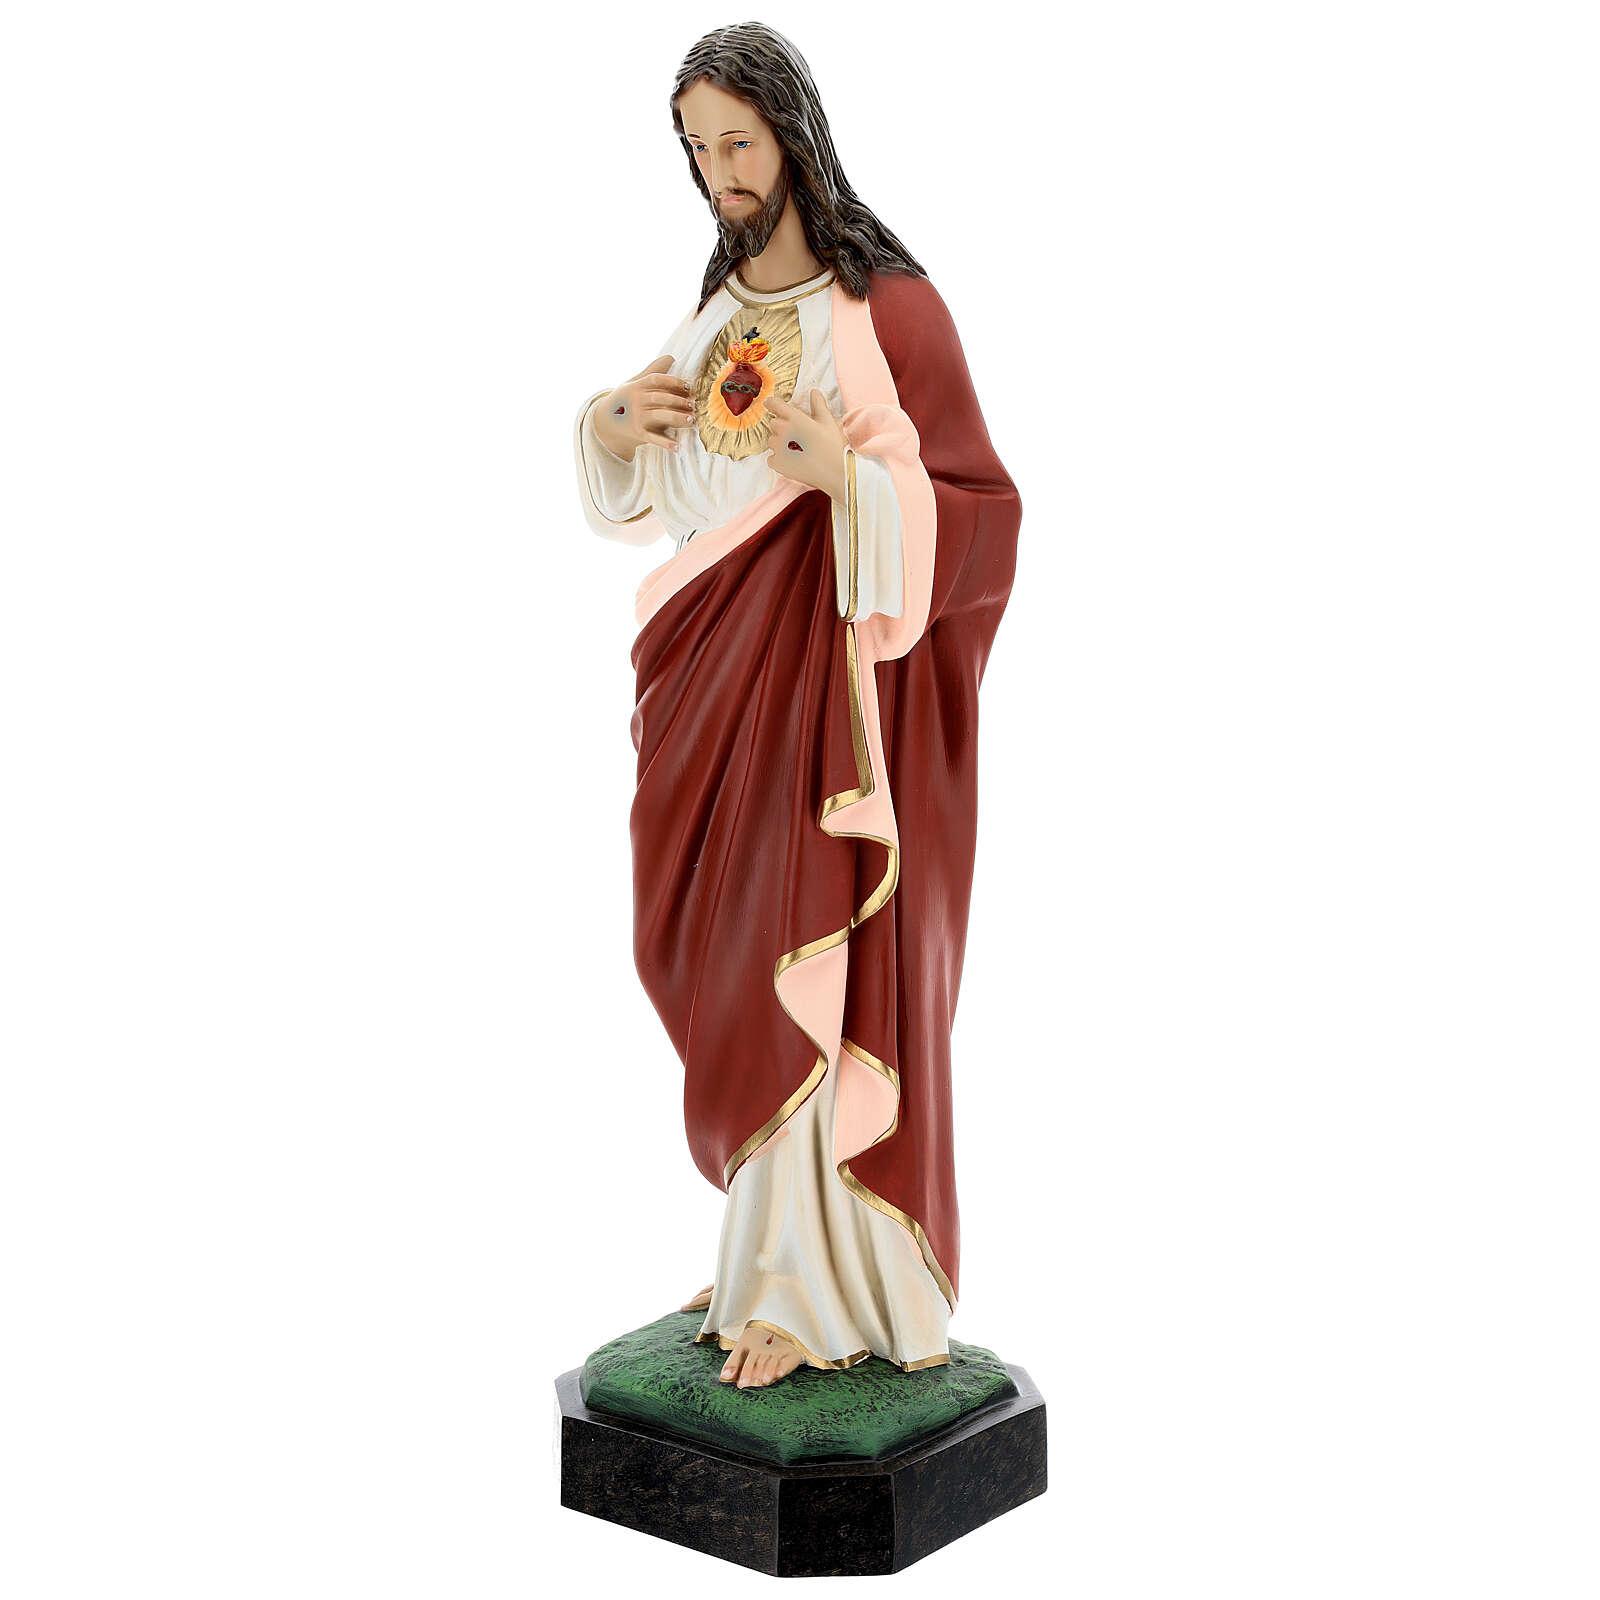 Statua Sacro Cuore Gesù 65 cm vetroresina dipinta 4